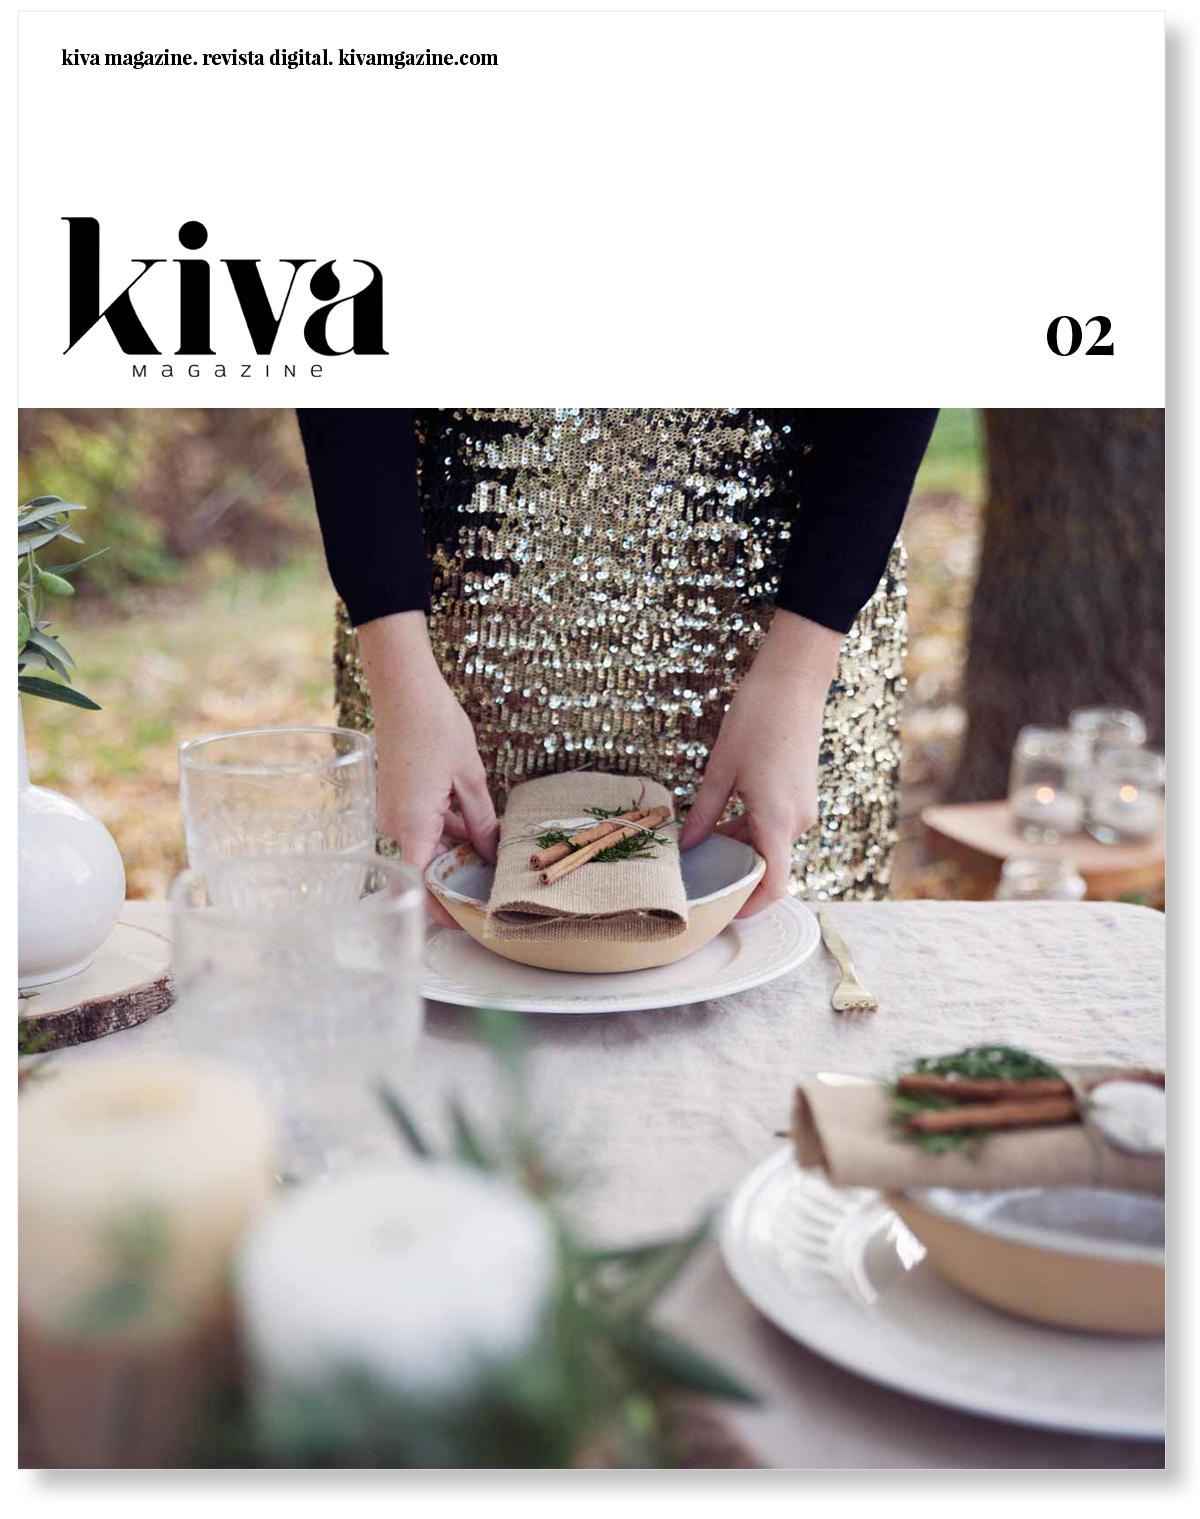 Segundo número Kiva magazine, portada